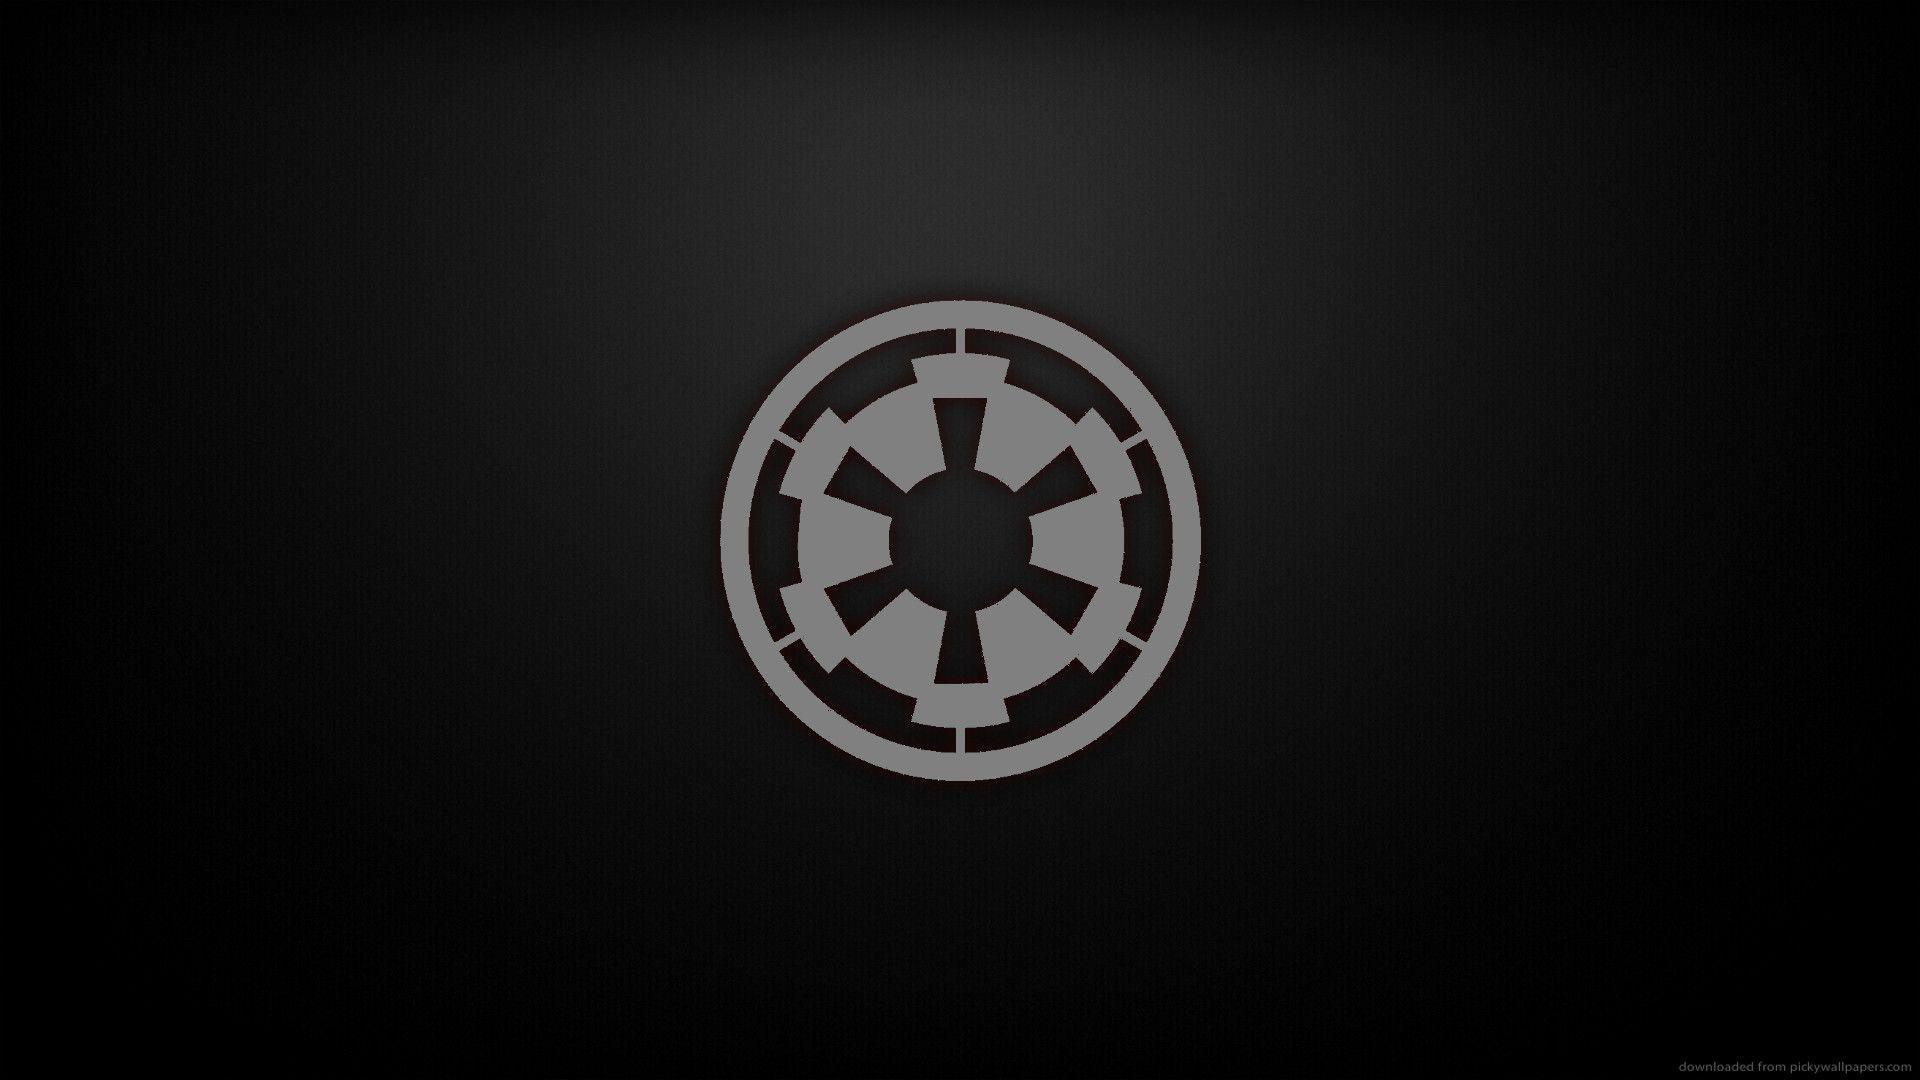 Star Wars Jedi Symbol Wallpapers Wallpaper Cave